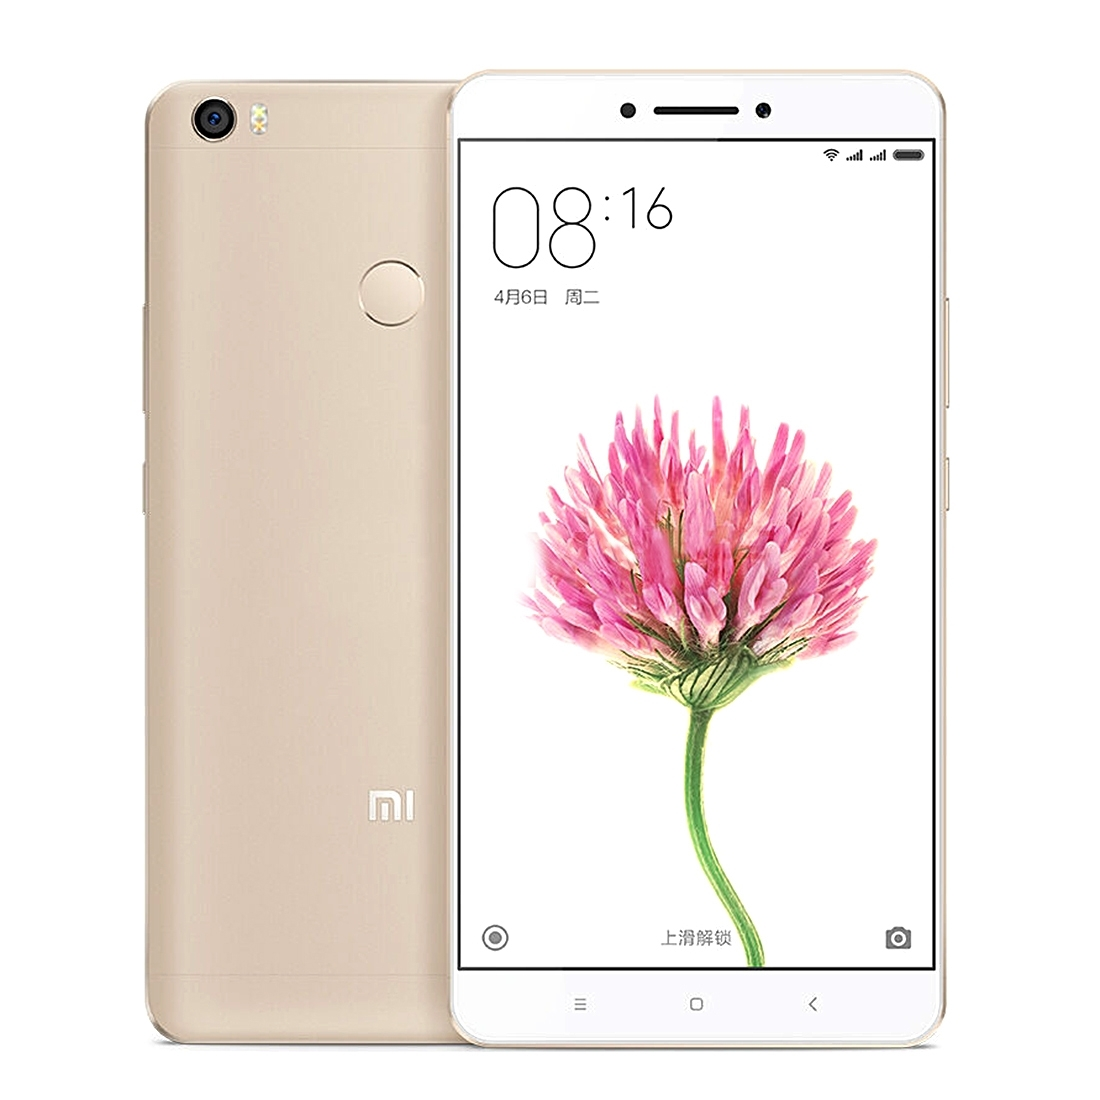 Original Xiaomi Max 6.44 inch Snapdragon 650 Hexa Core MIUI 8 OS RAM 3GB ROM 32GB 4G Phone Call Tablet PC, 4850mAh 16MP